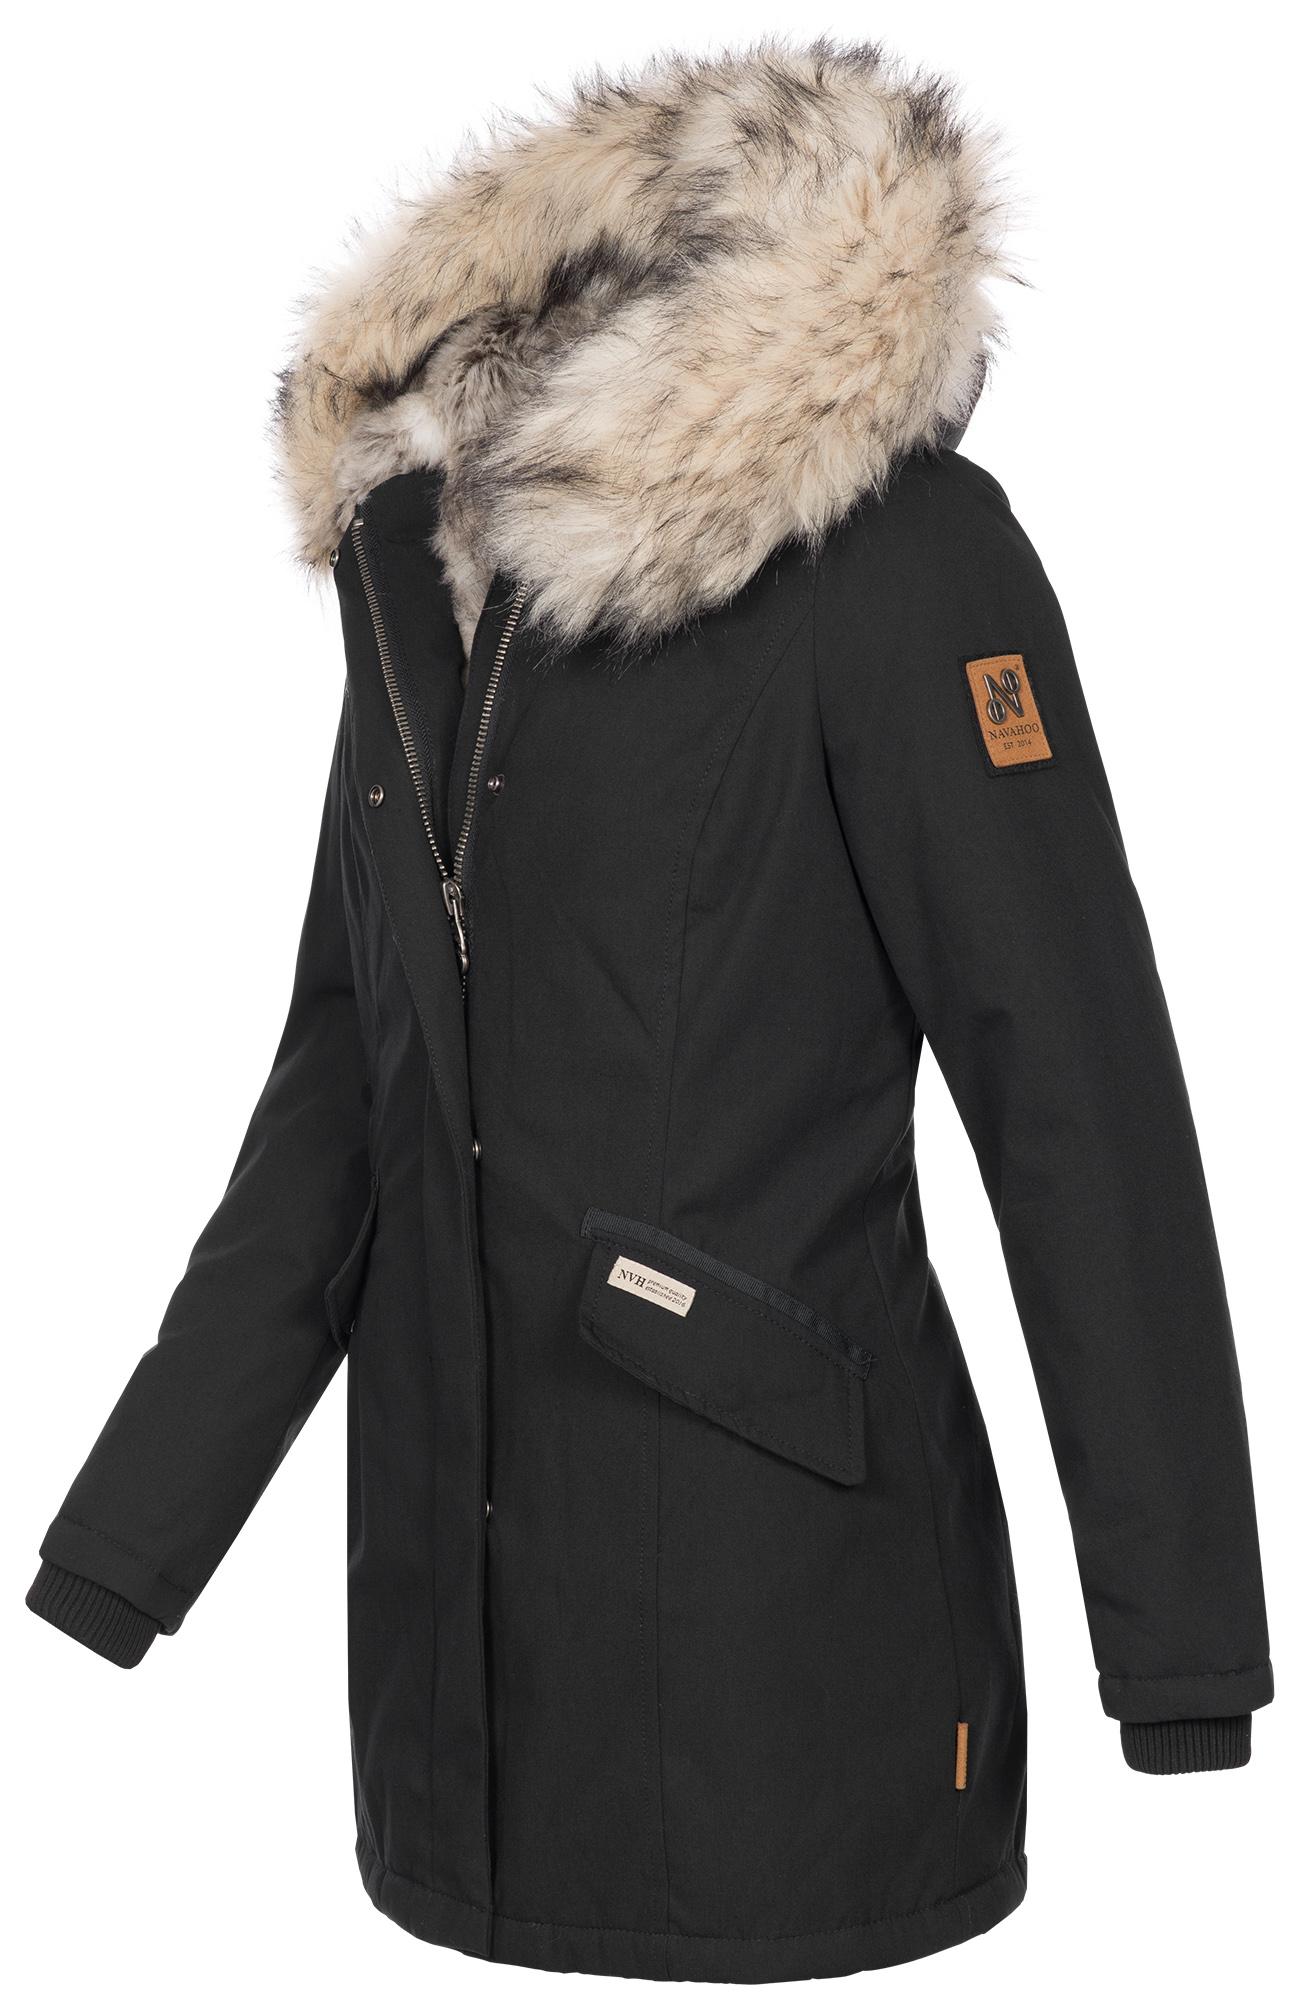 Navahoo-Premium-Damen-Winter-Jacke-Parka-Mantel-Winterjacke-warm-Kunstfell-B669 Indexbild 4